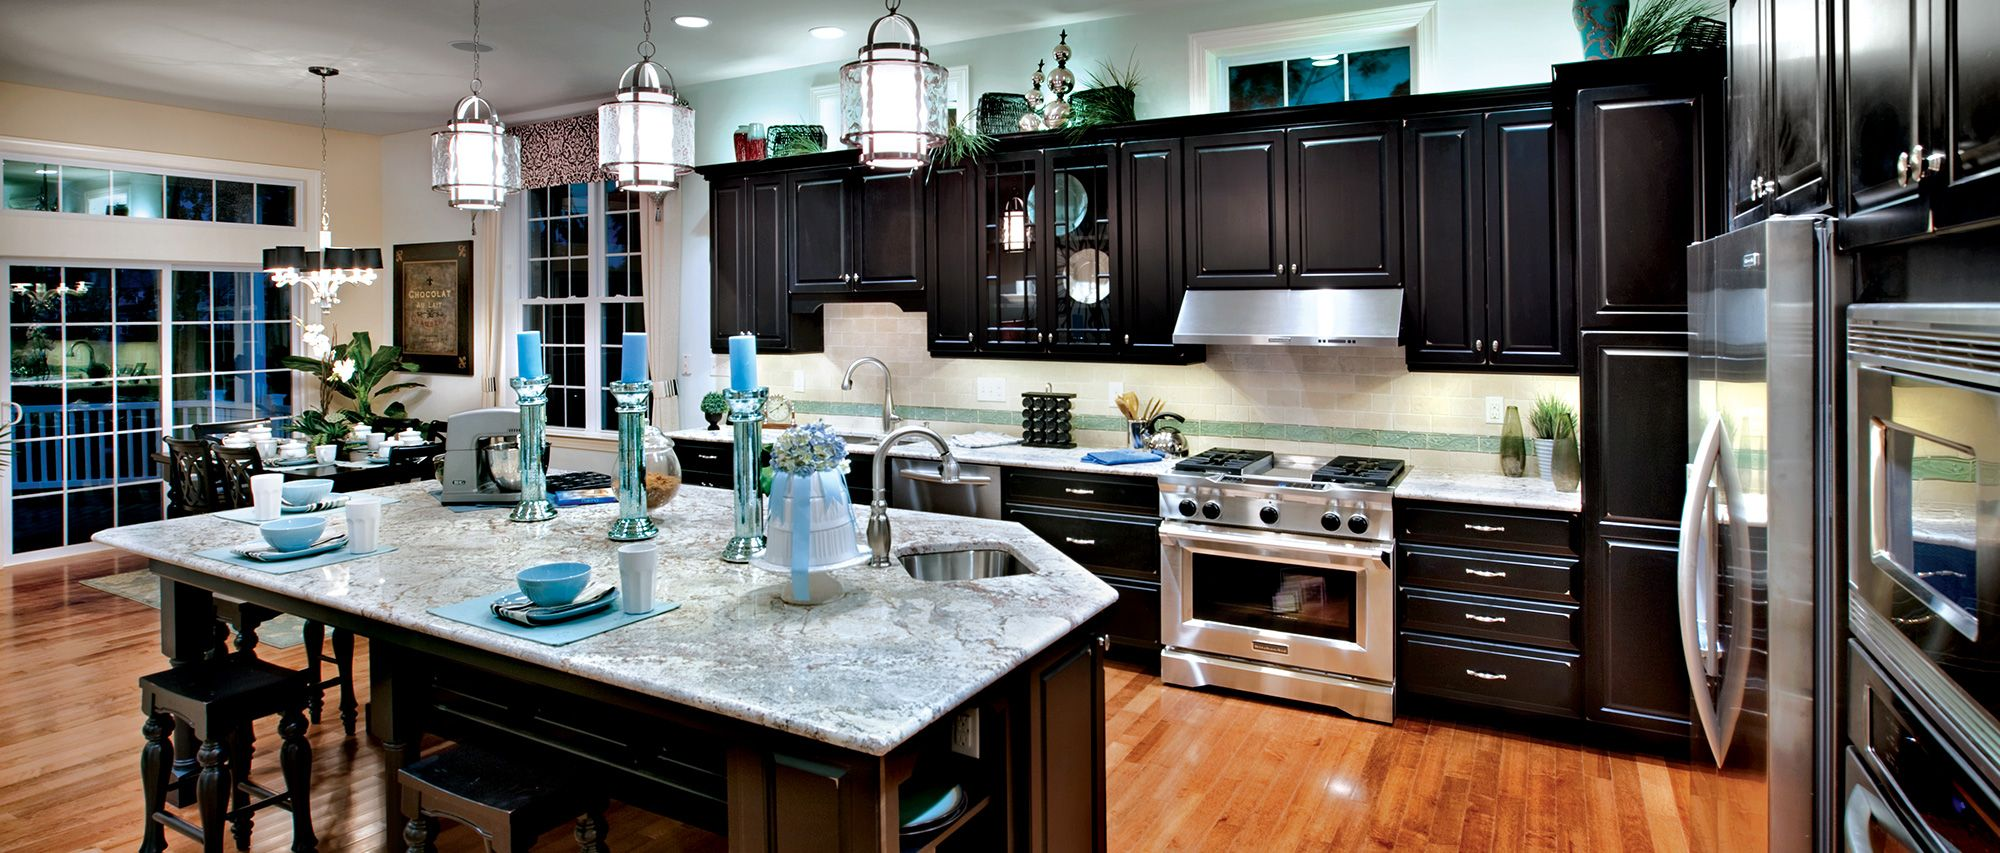 Toll Brothers Design Studio Design Tools Luxury Houses Kitchen Luxury Kitchen Design Luxury Kitchens